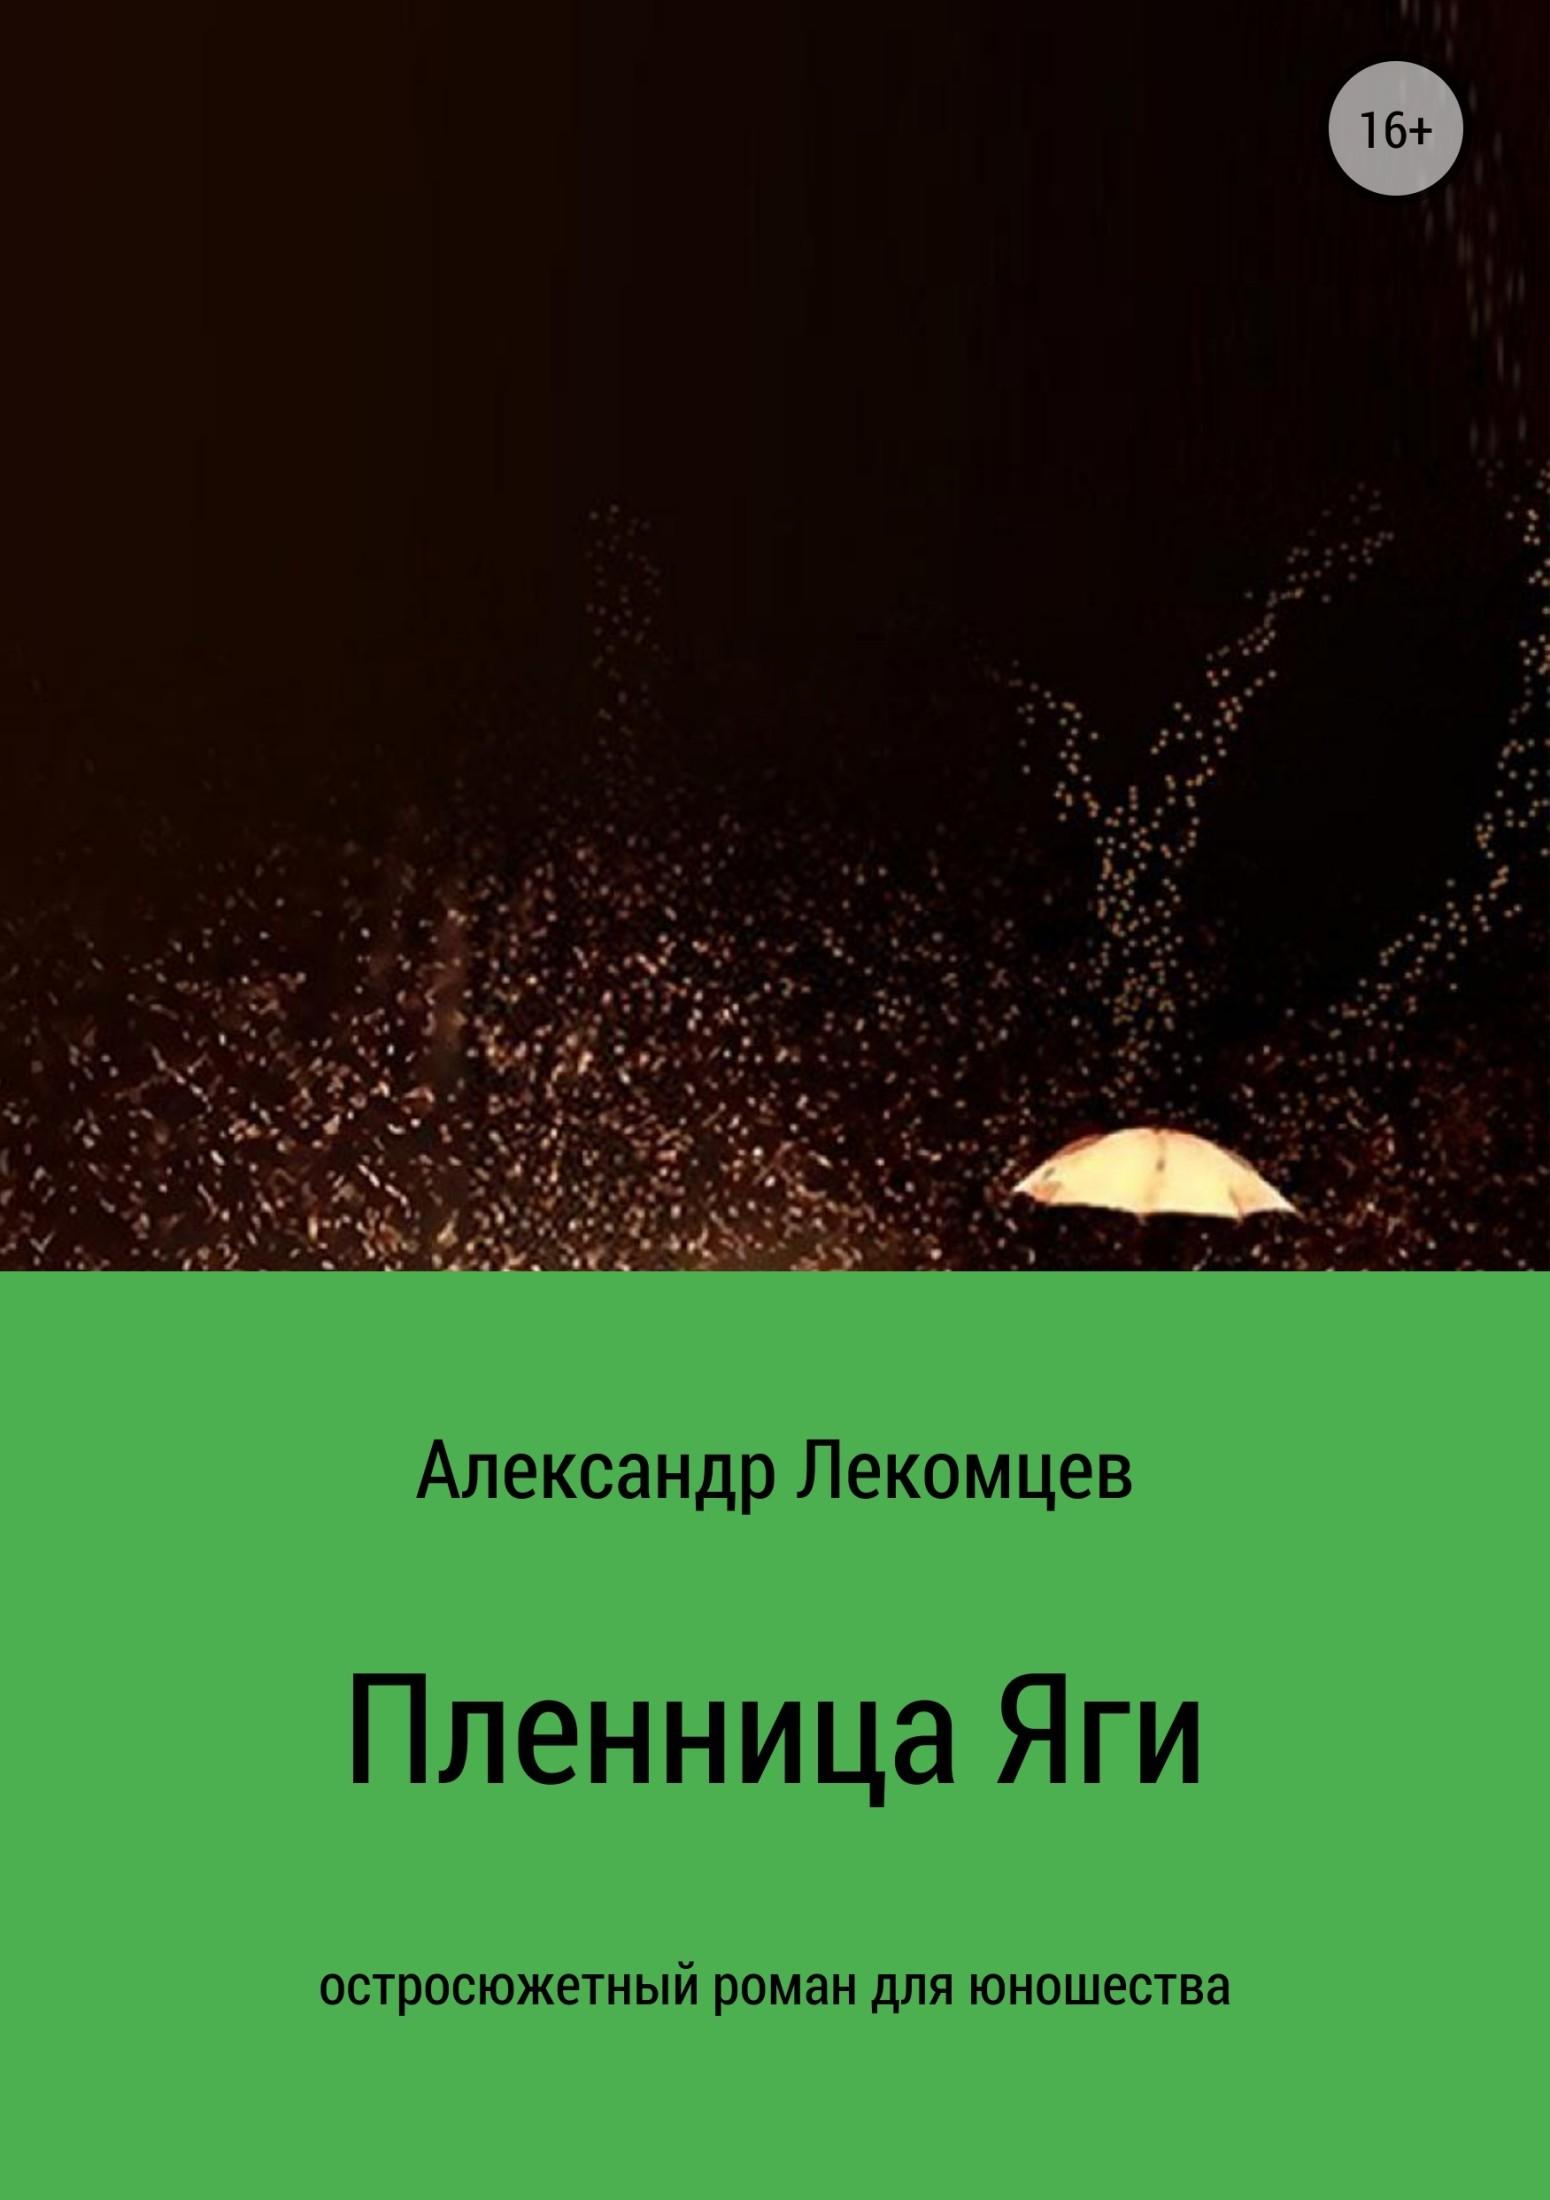 Александр Николаевич Лекомцев Пленница Яги